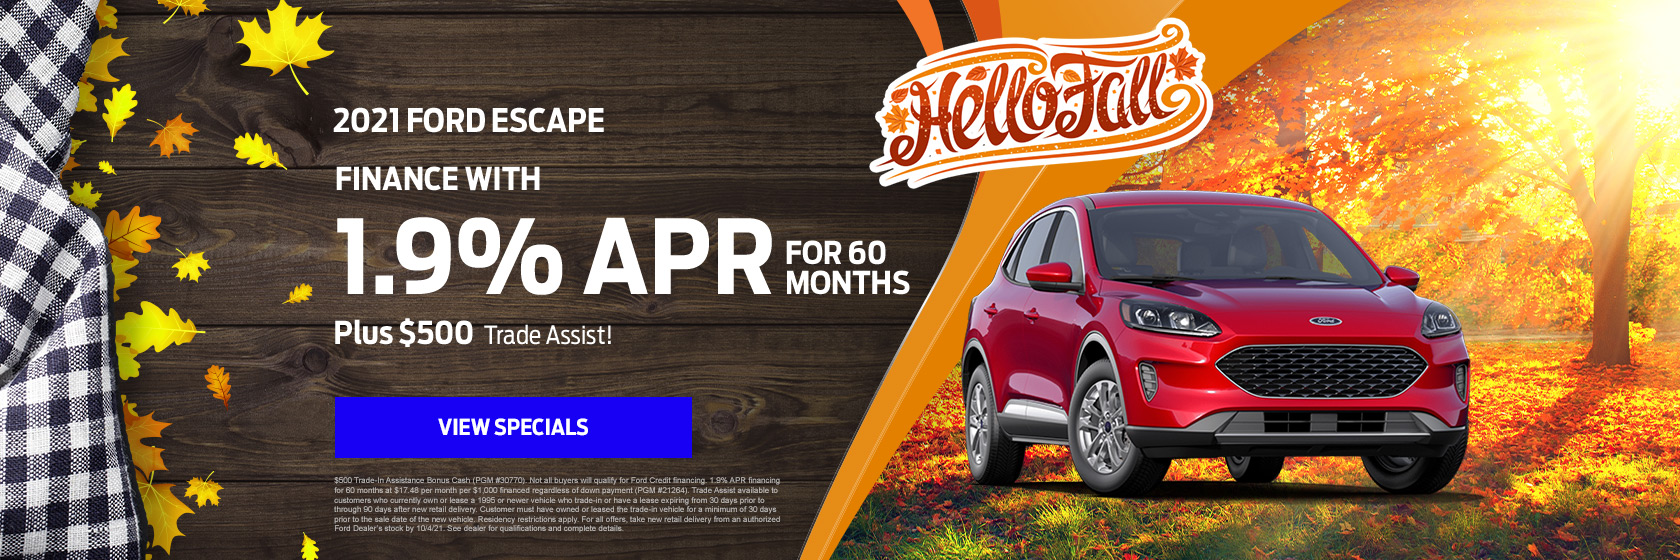 2021 Ford Escape September Special